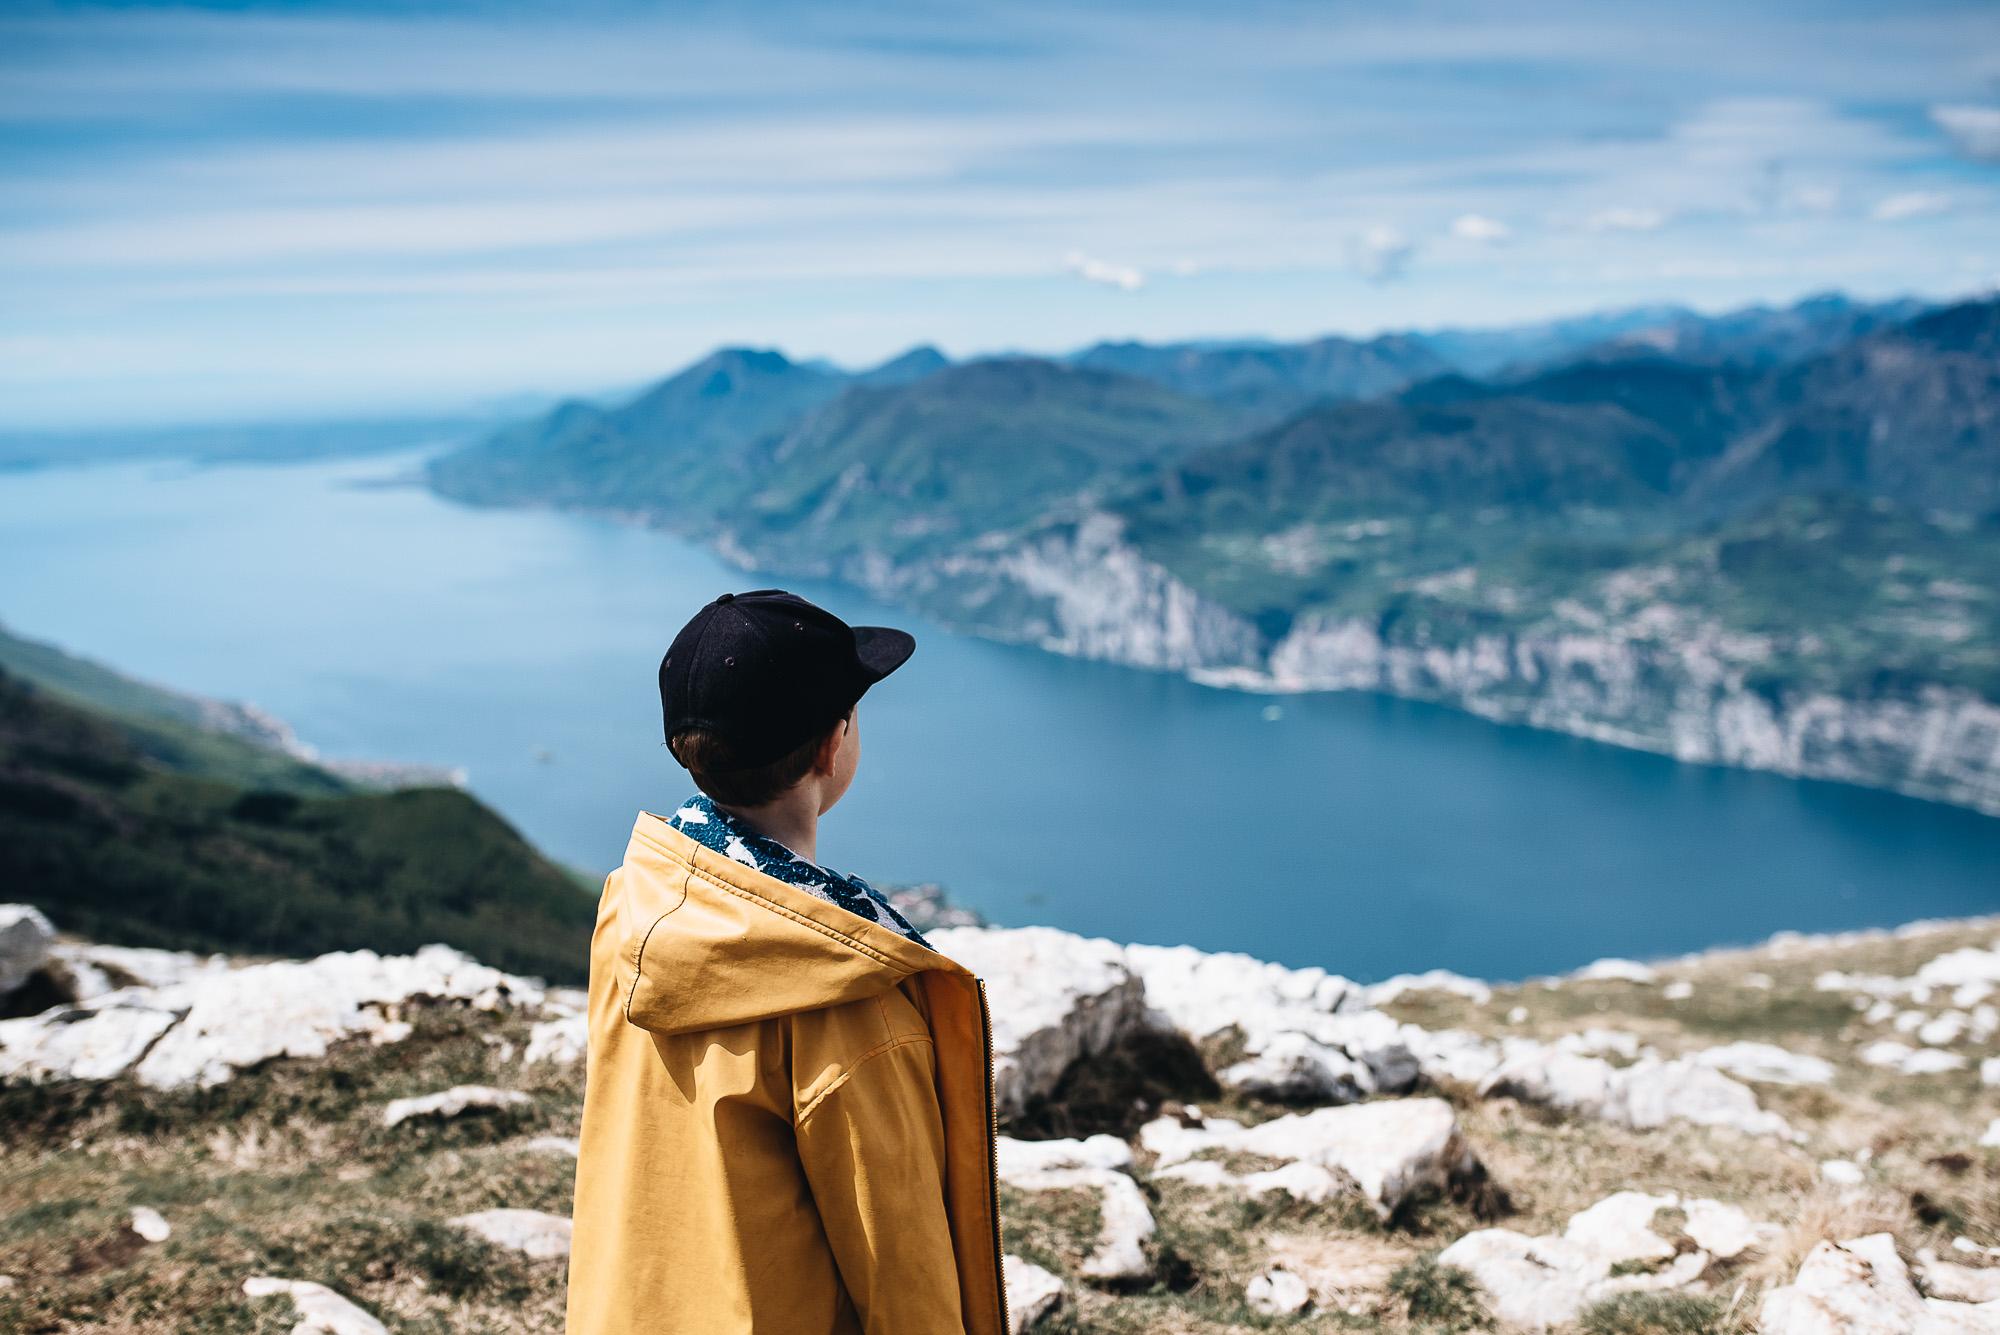 OurBeautifulAdventure-LakeGarda-Italy-Blog-2.jpg